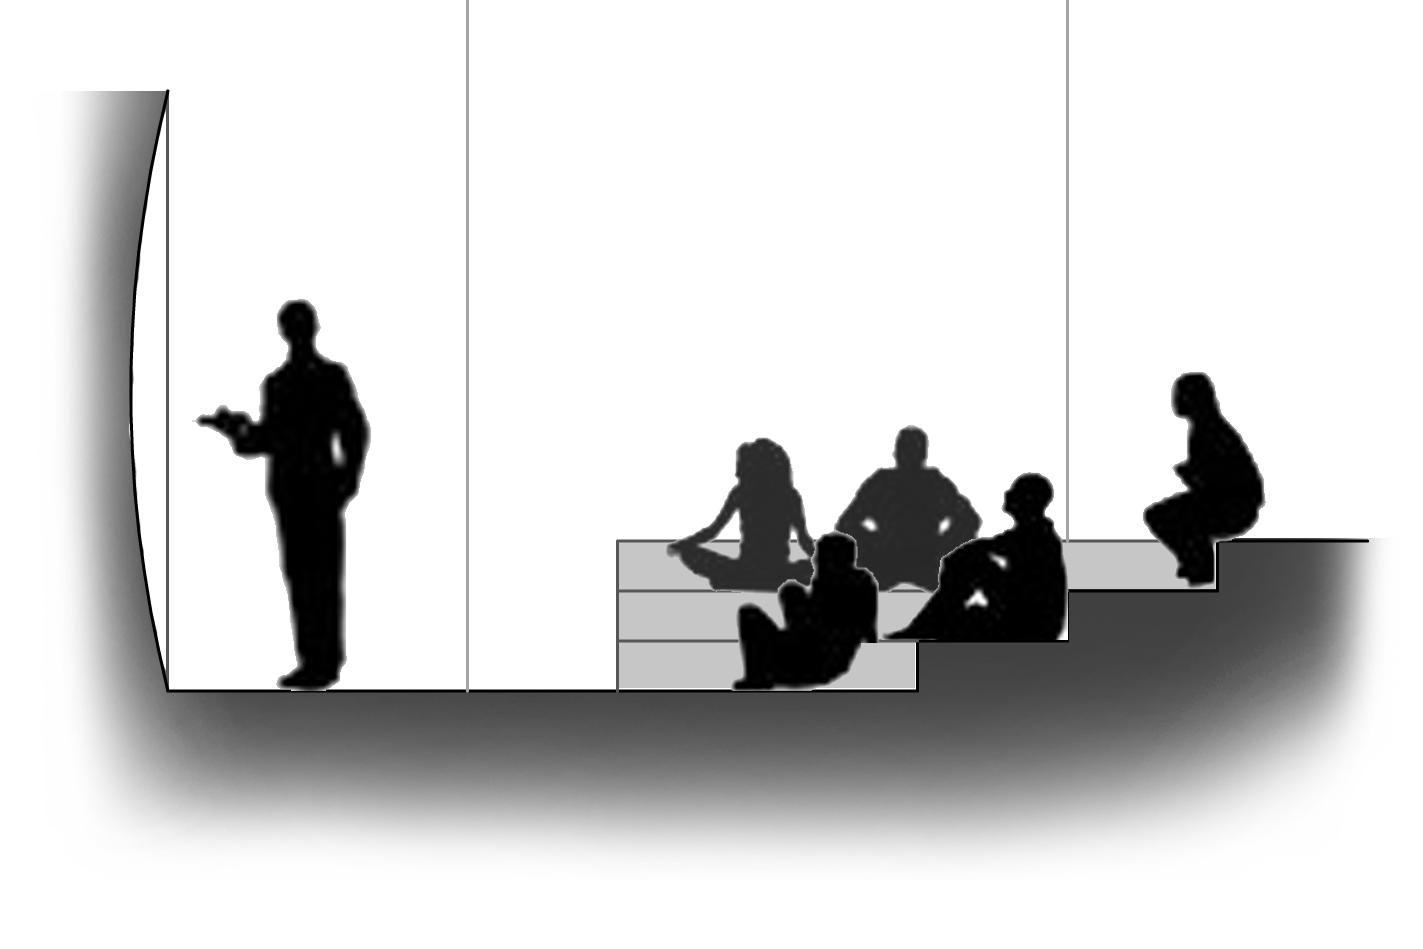 Student Center - Presentation & Study Areas -SUNY Purchase, NY